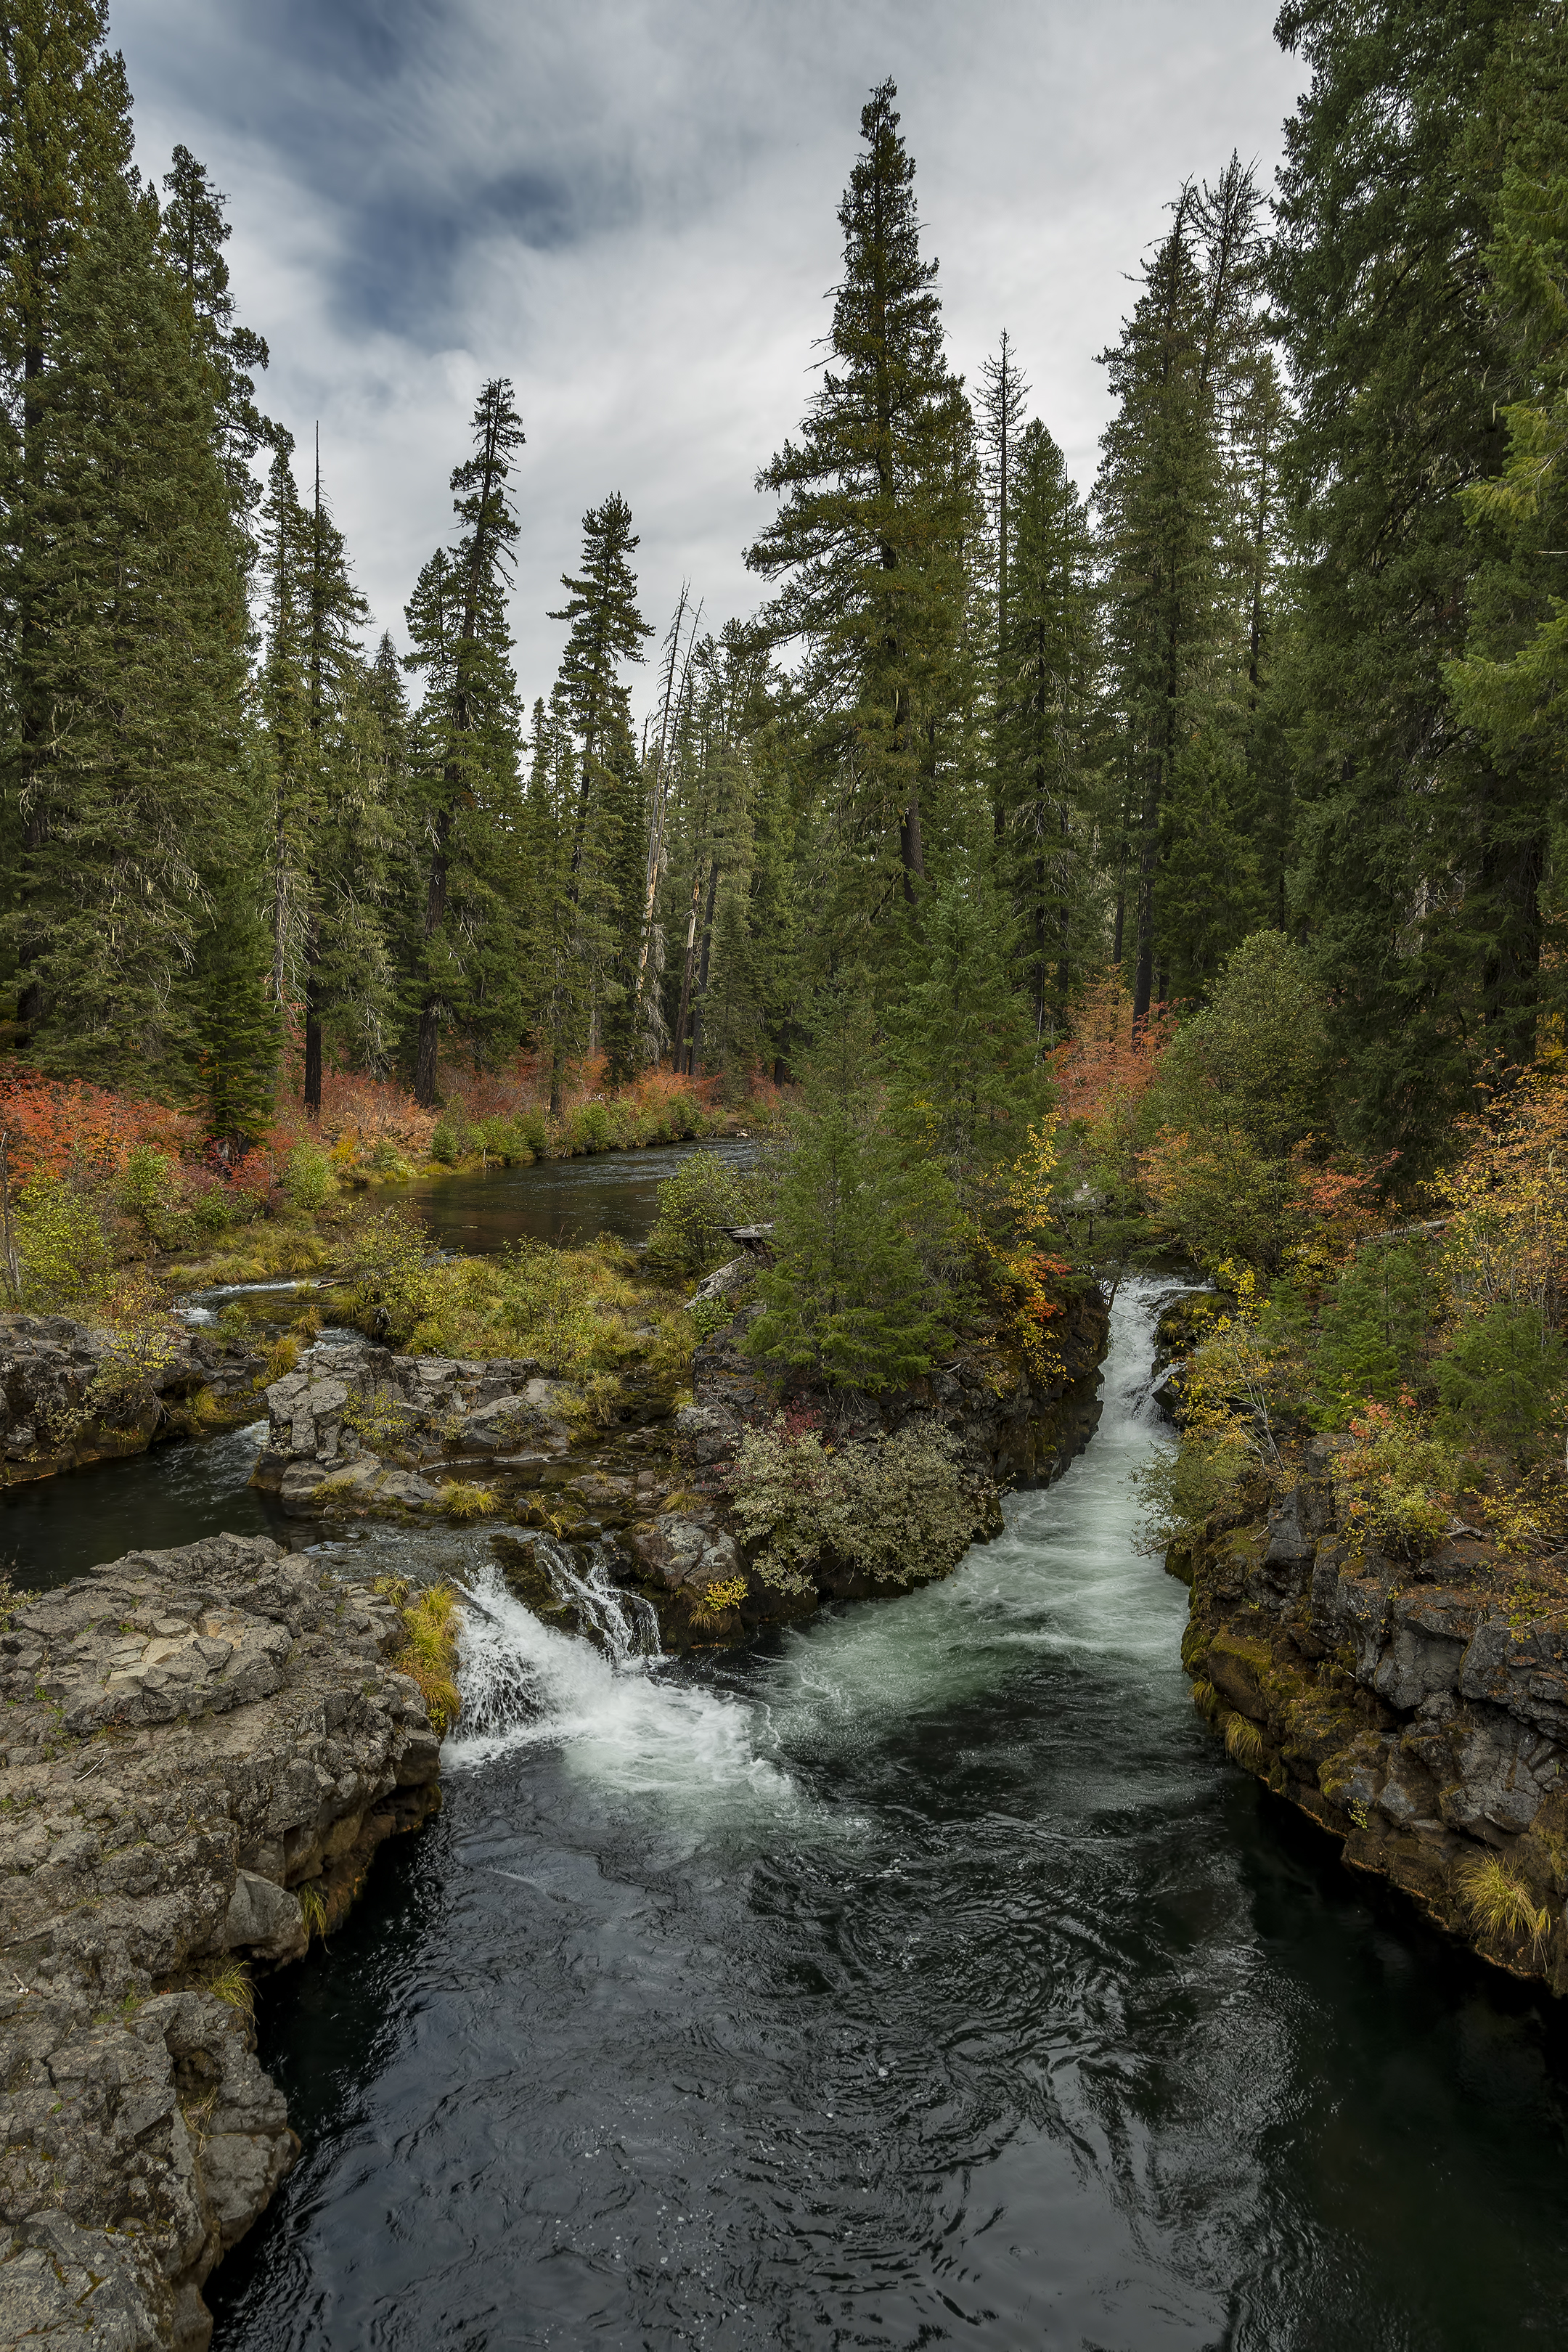 woodruff bridge rogue river upper trail